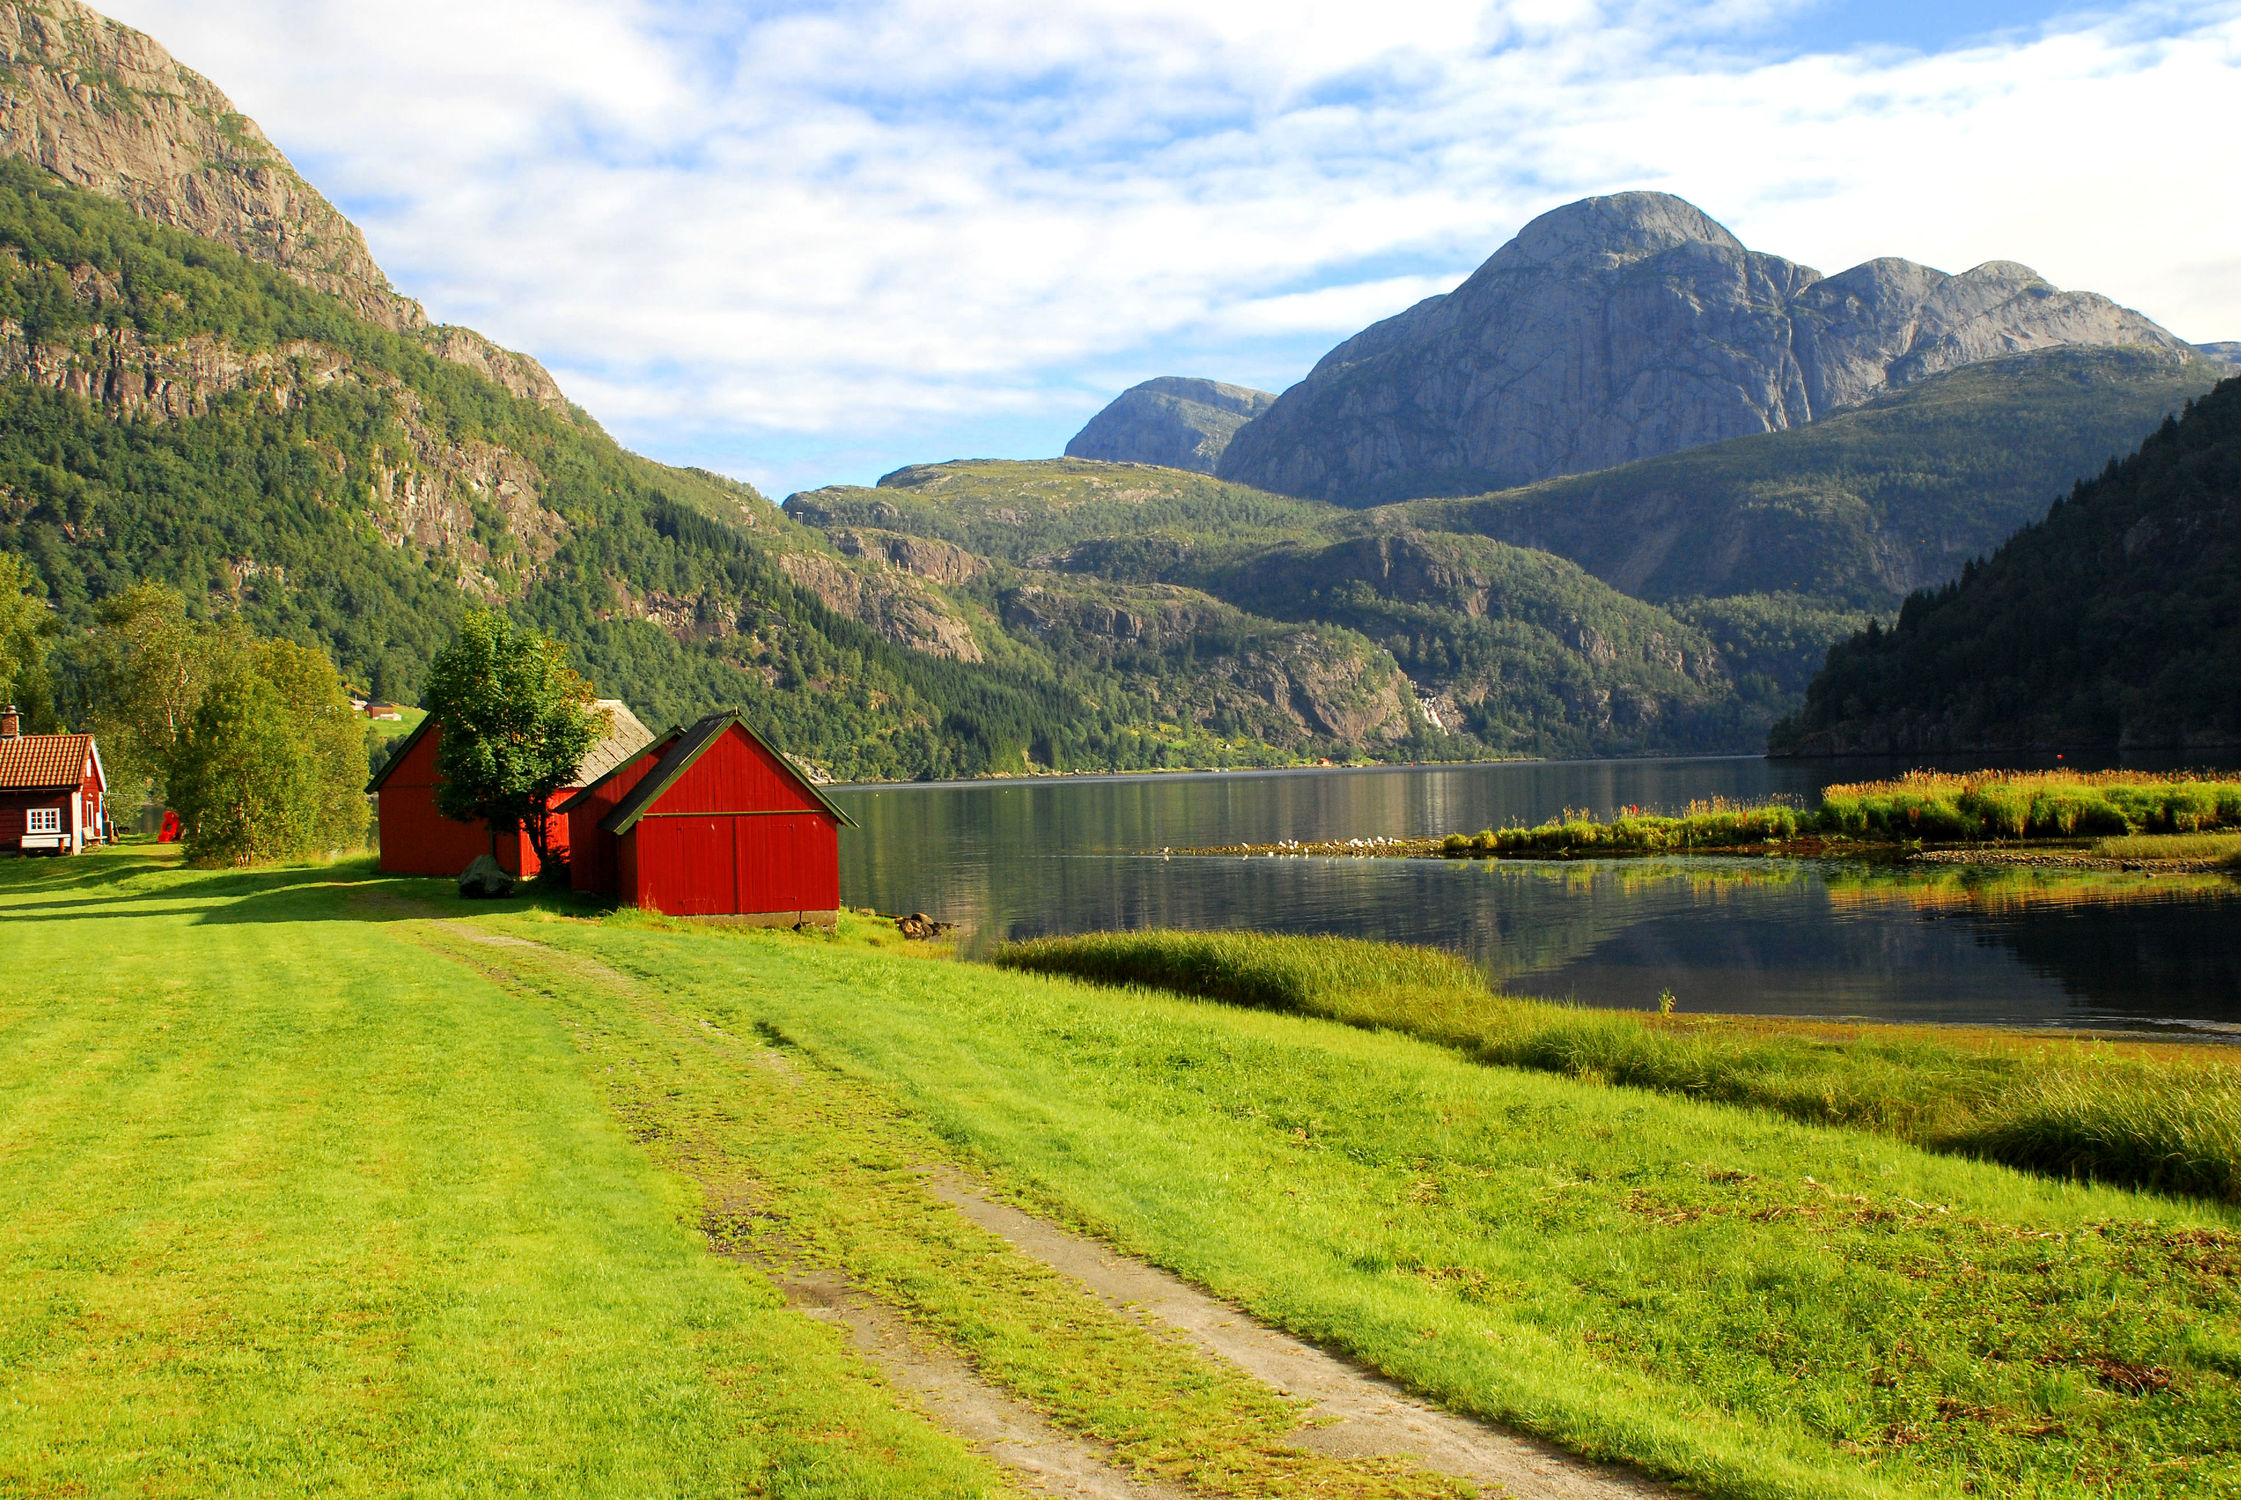 Bild mit Natur, Wasser, Landschaften, Berge, Landschaft, See, Norwegen, berg, Gebirge